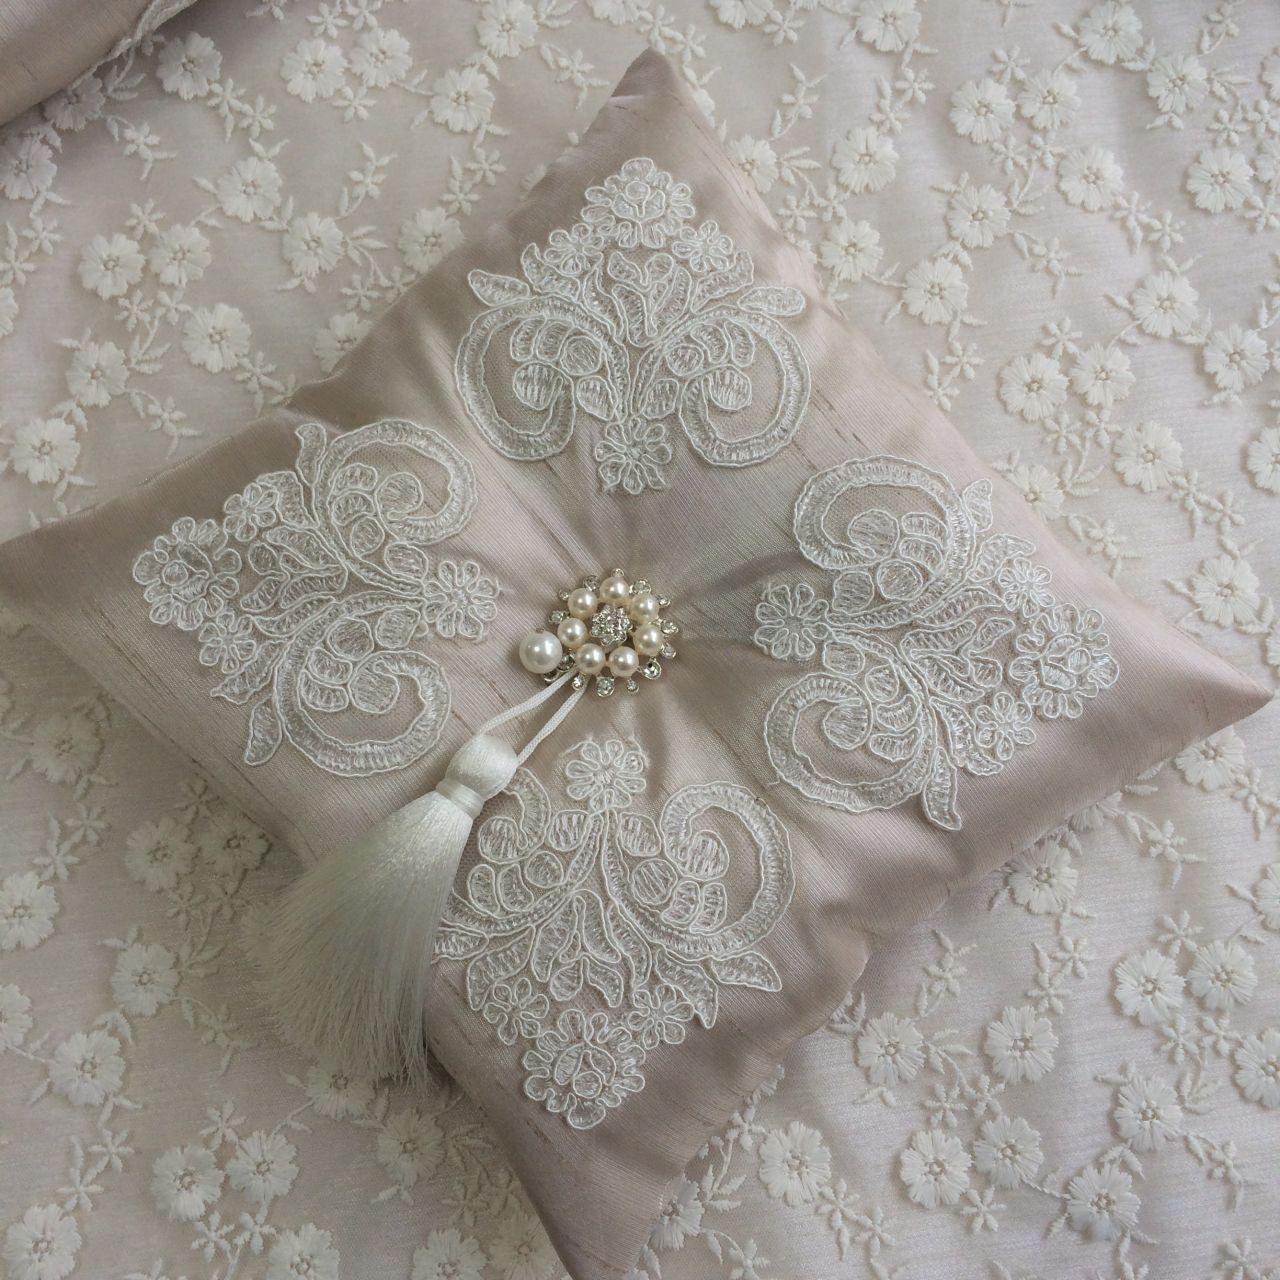 Fransız dantelli lavanta yastığı cappuccino cushions and ring